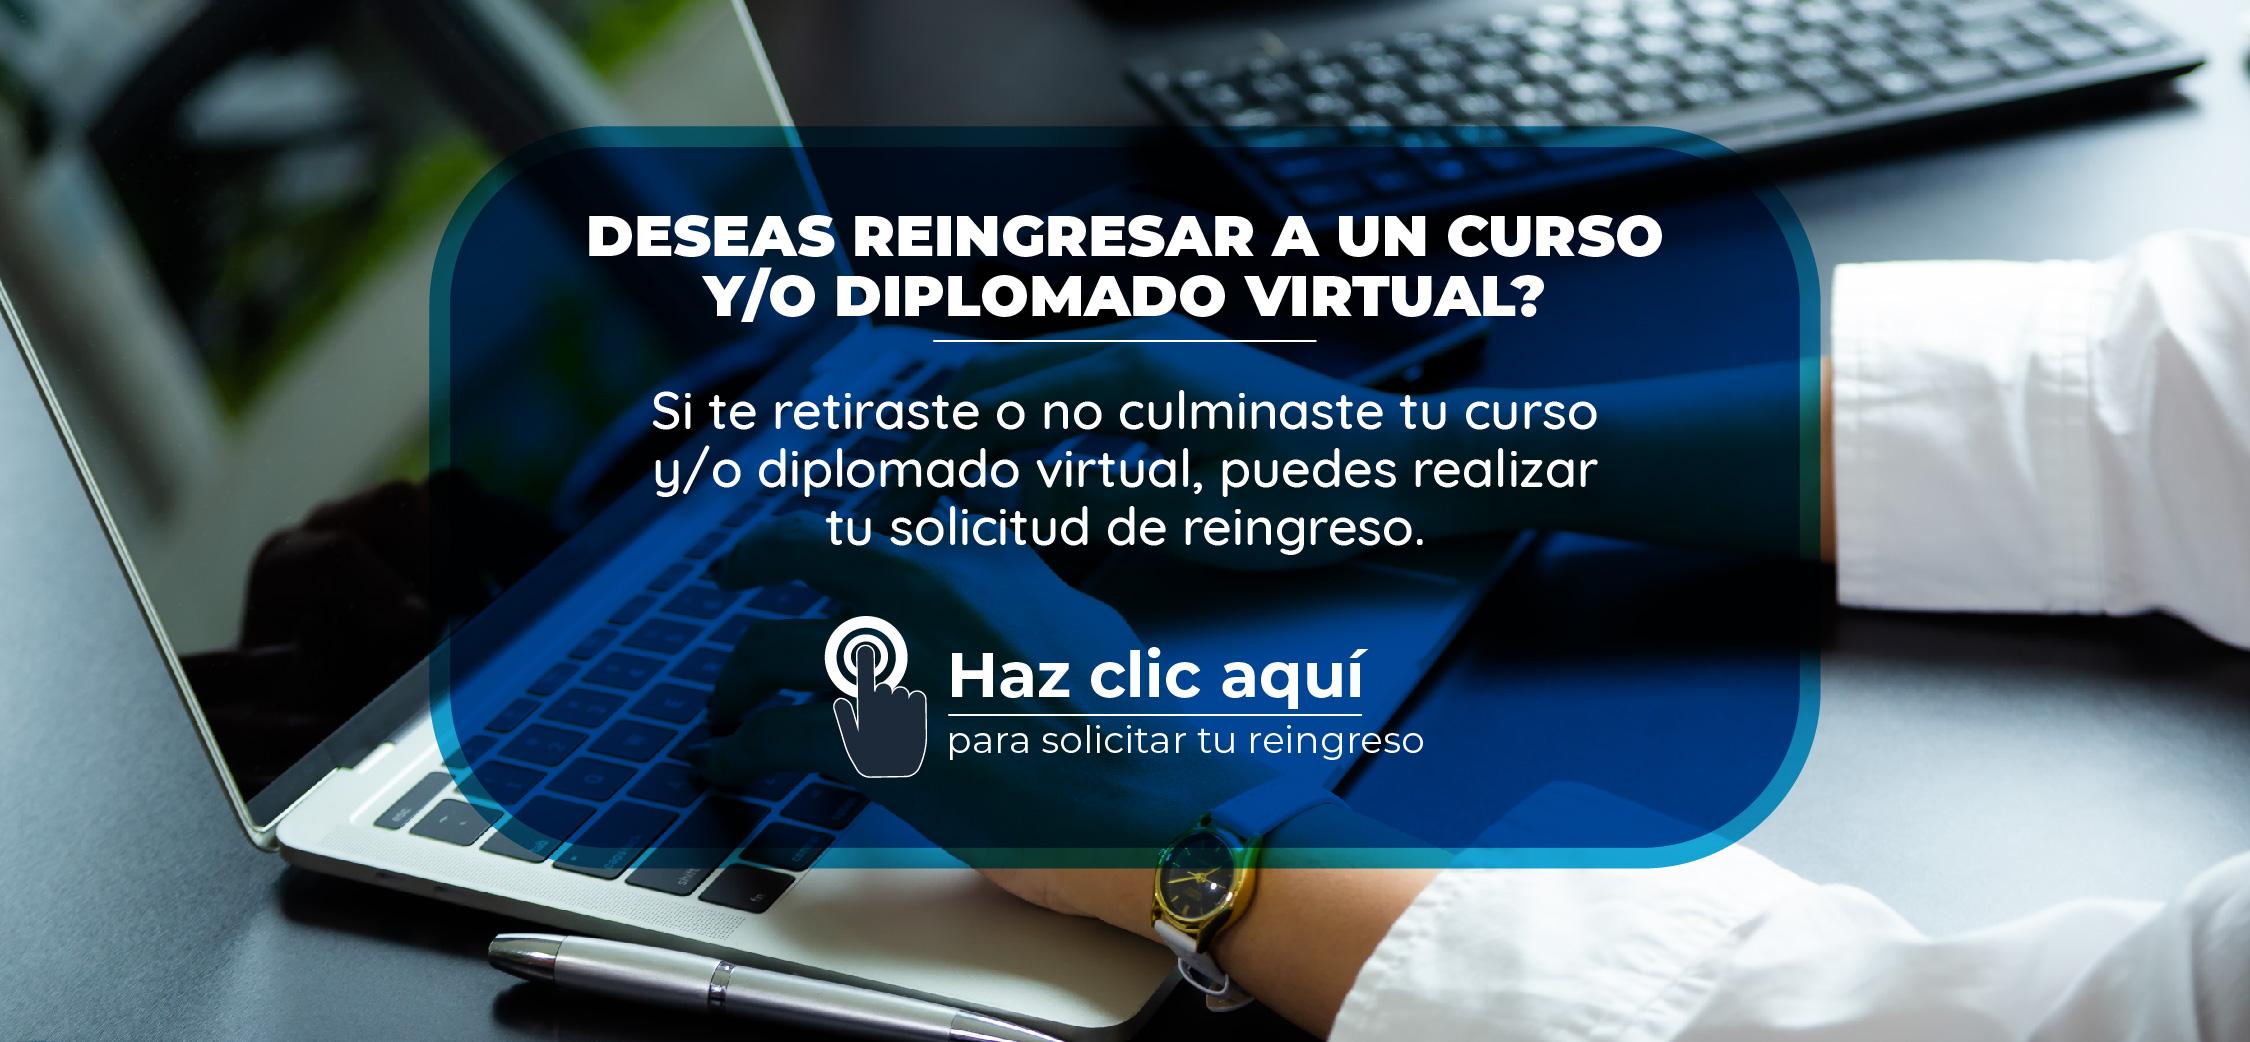 Reingreso_escuela_virtual_20199-01